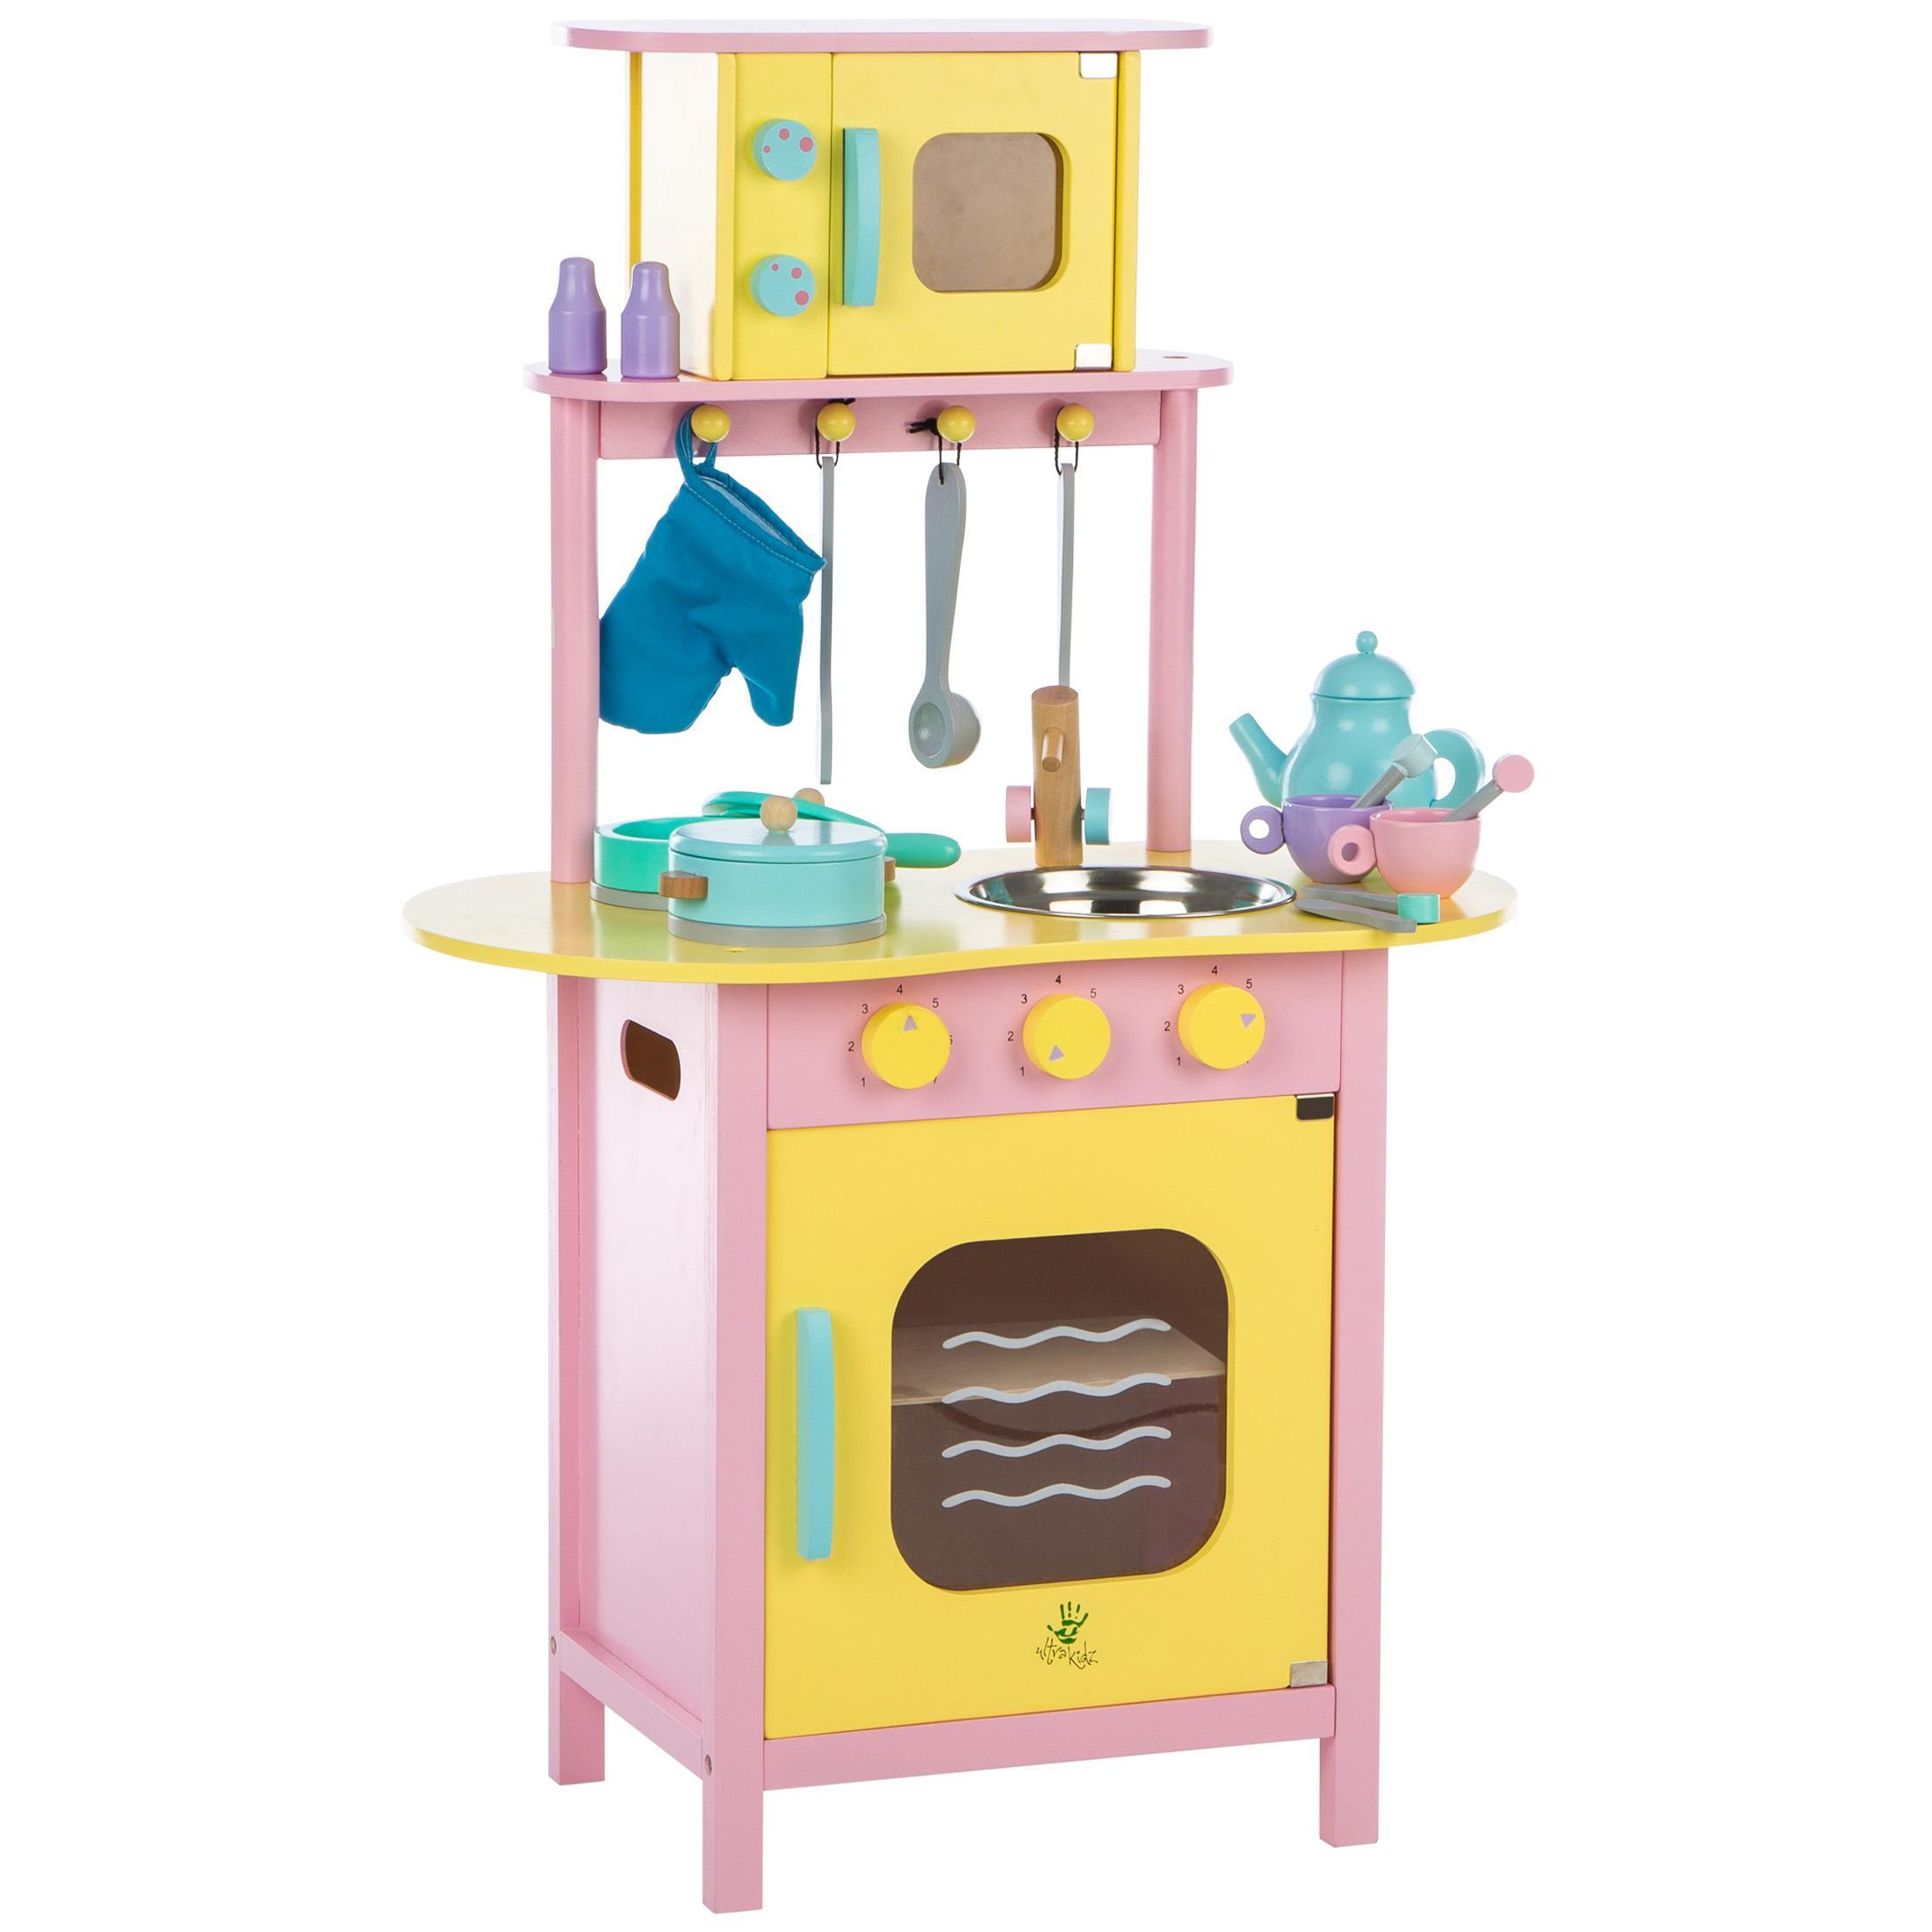 Ultrakidz cocinita de juguete de madera con horno y for Utensilios de cocina para microondas